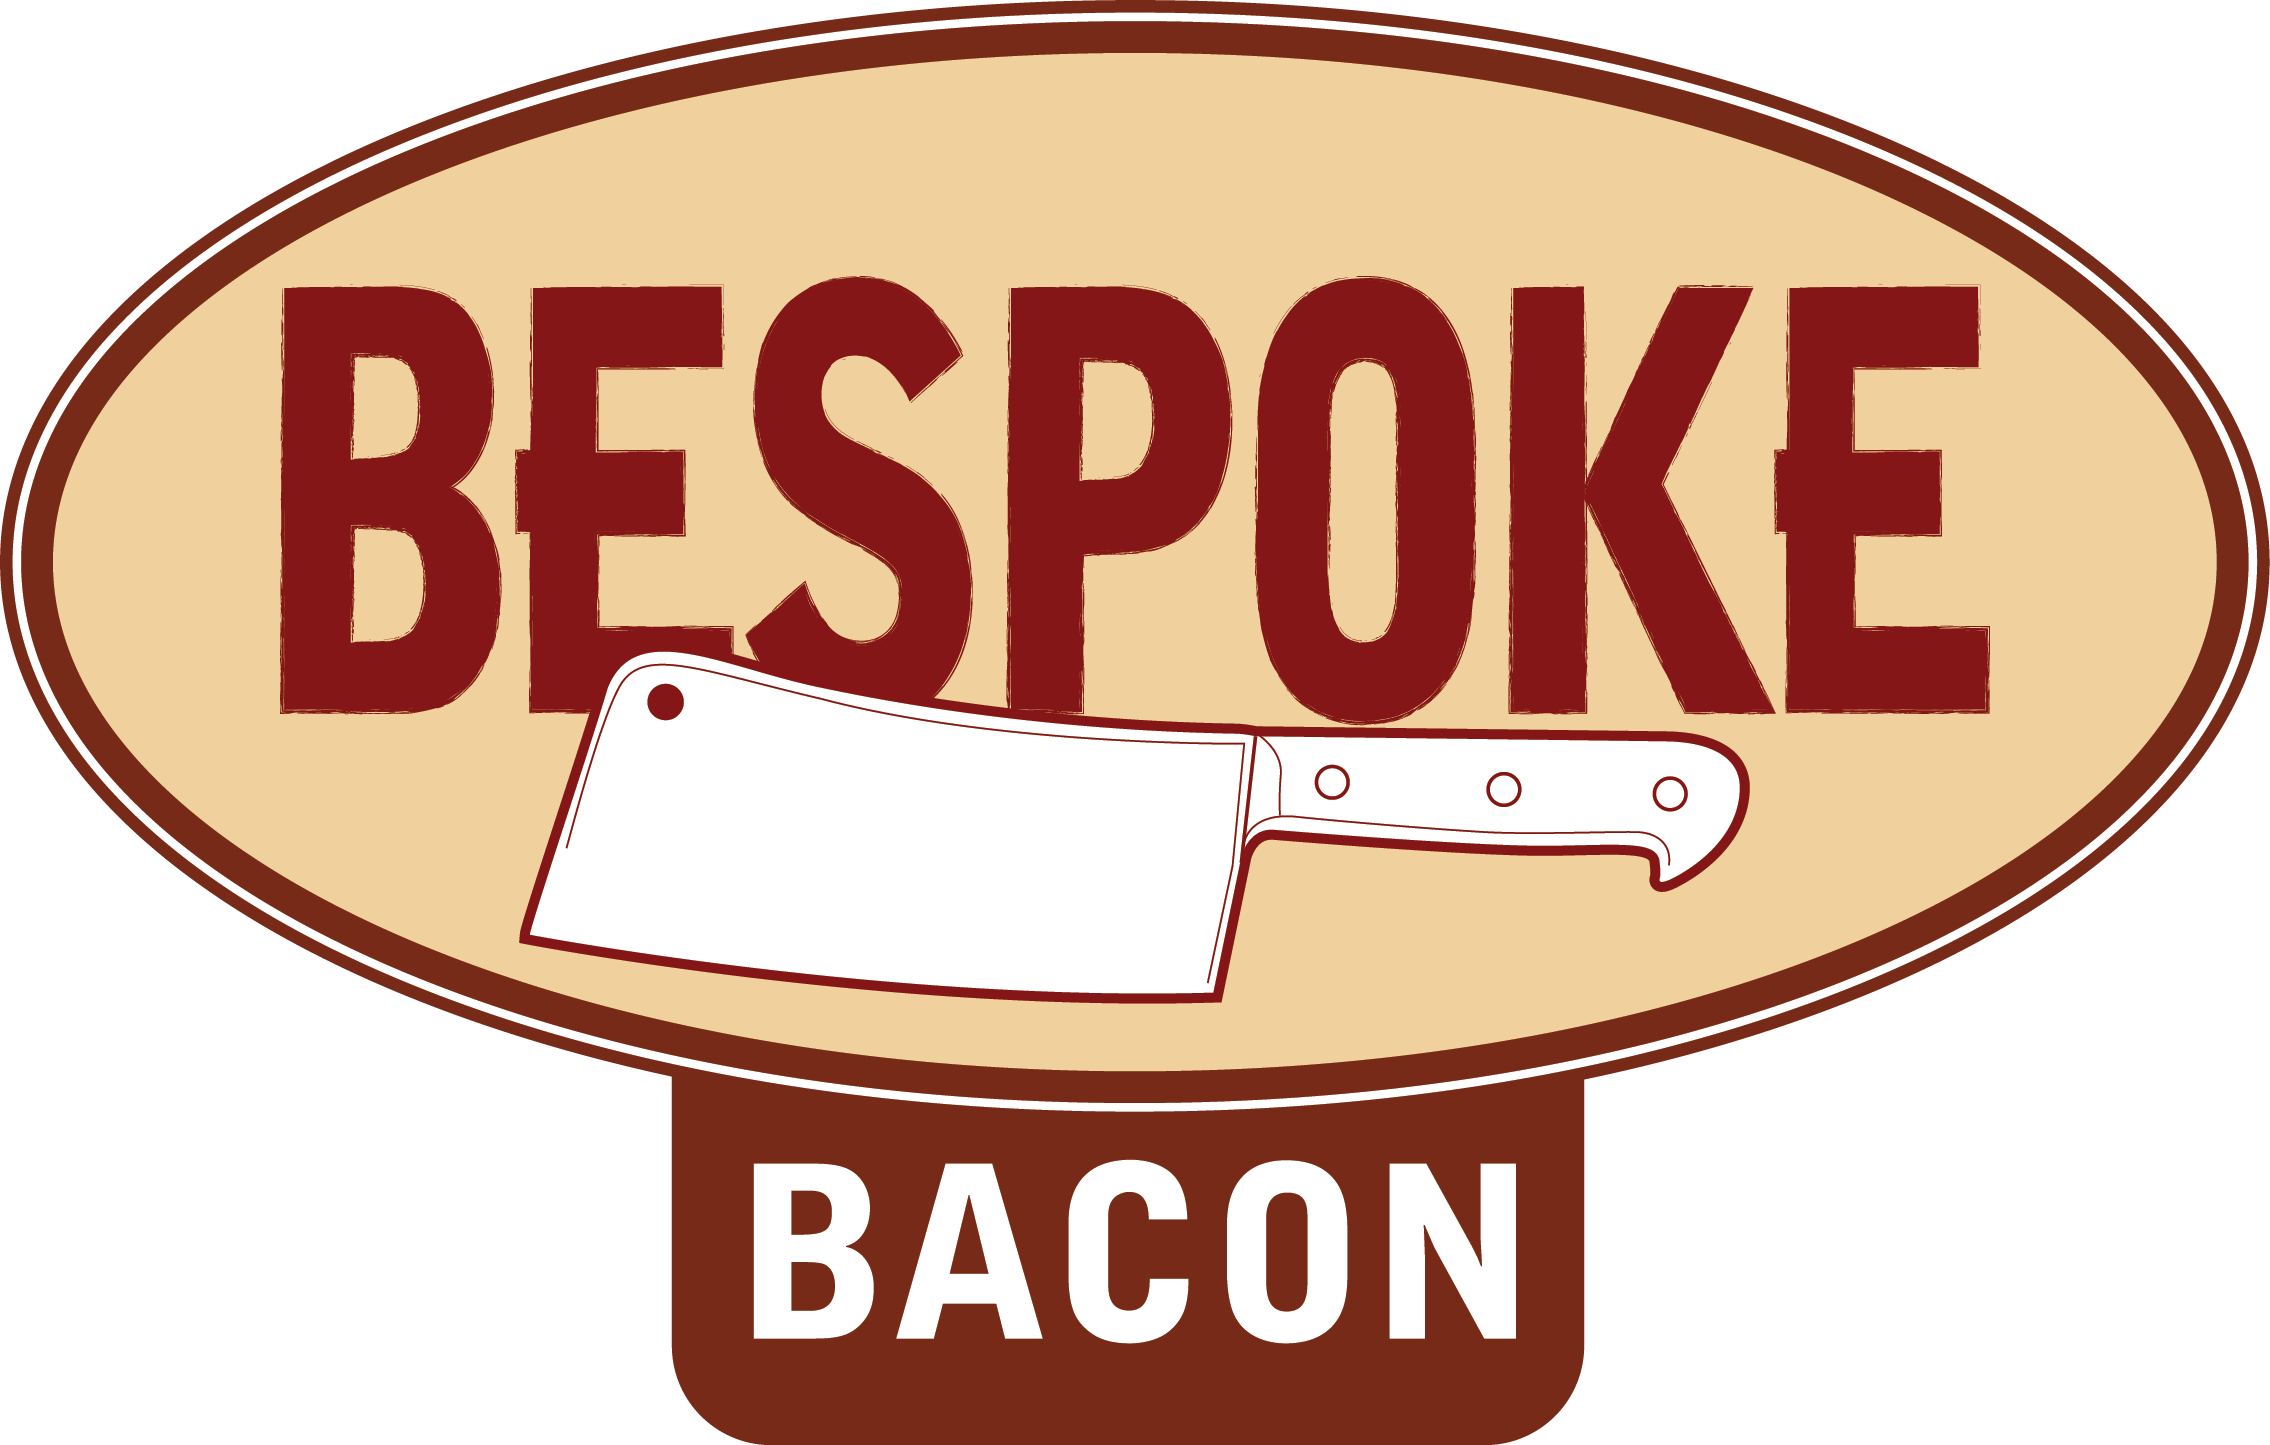 Bespoke bacon artisan gourmet. Jalapeno clipart sliced